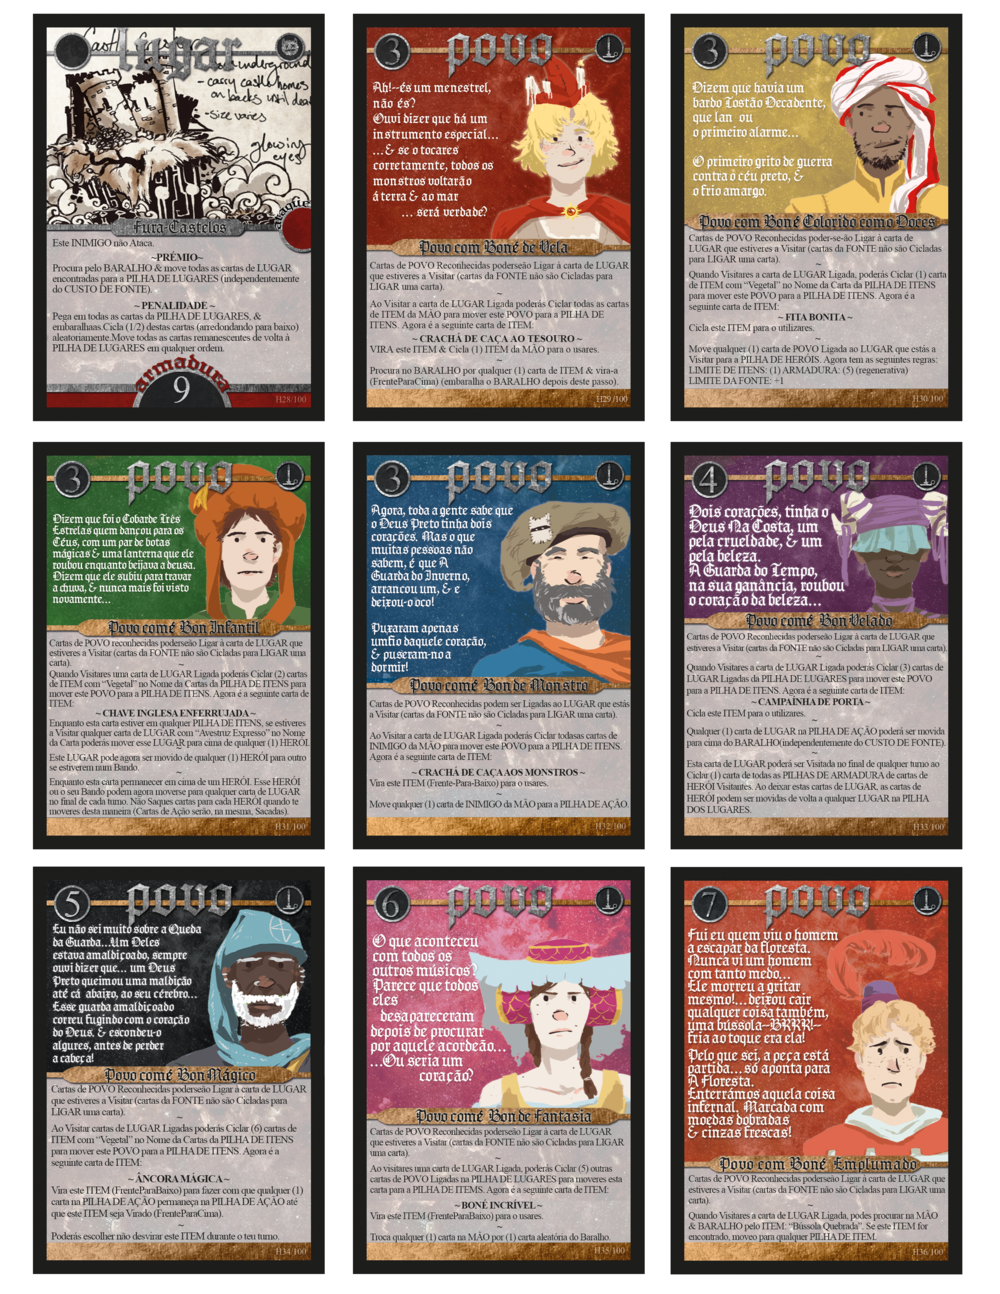 2014/2015 Portuguese edition Folk cards by Todd, Lauren, & Dual Pistoleiro